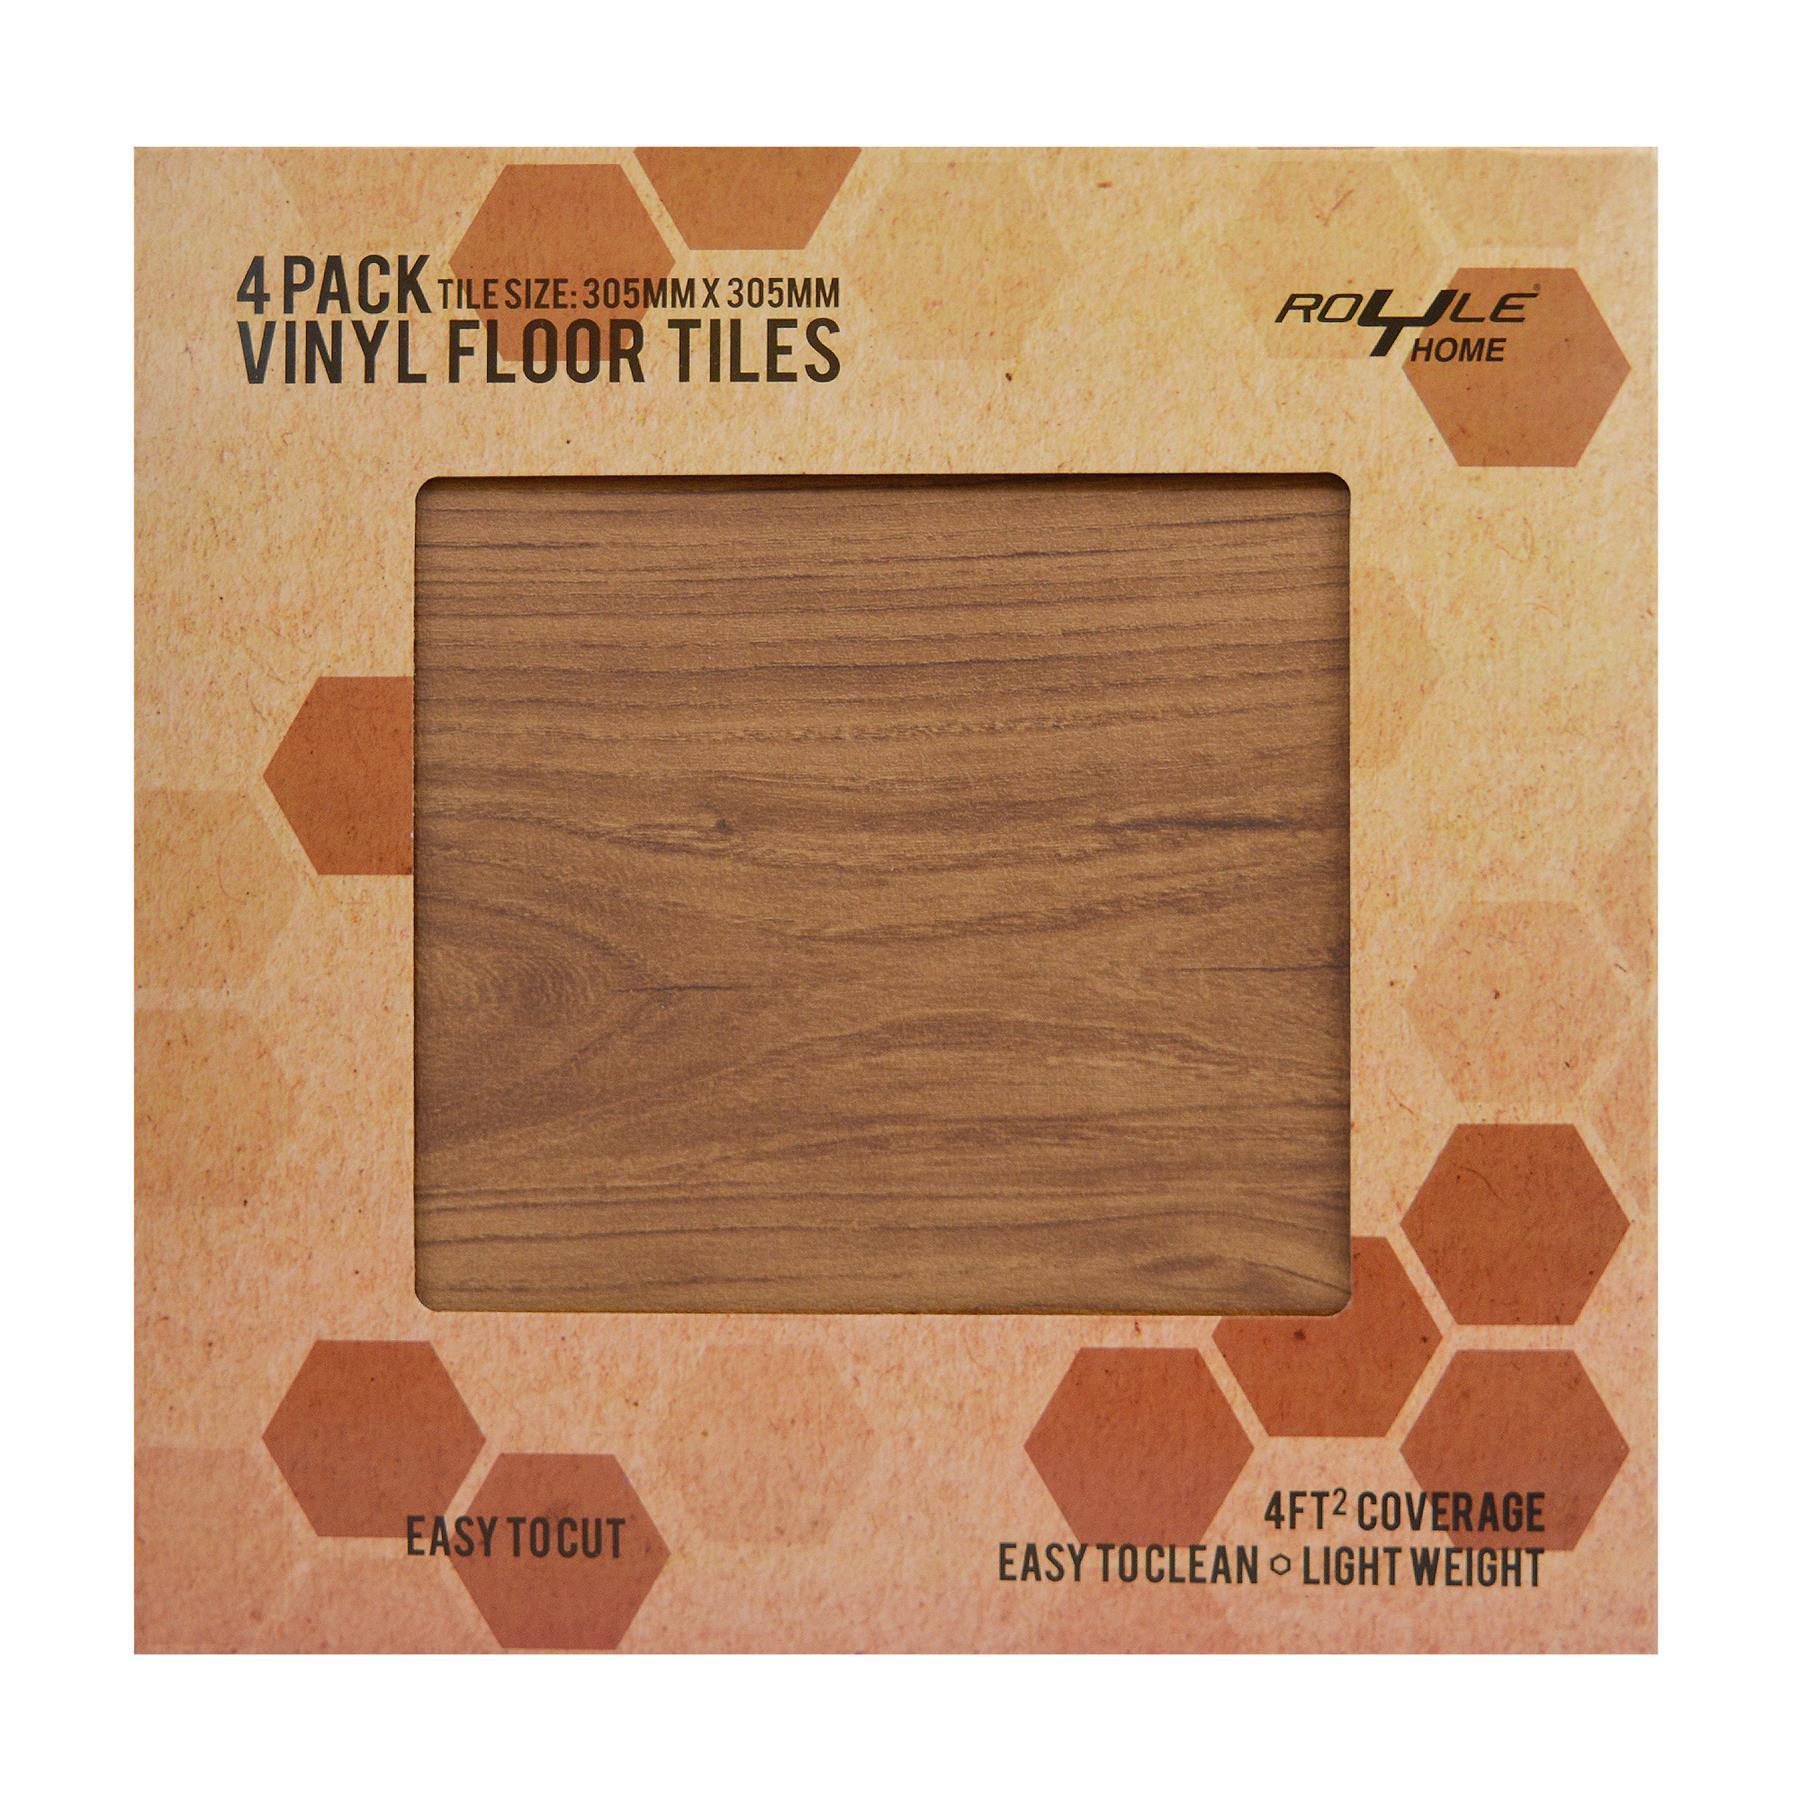 Floor-Tiles-Self-Adhesive-Vinyl-Flooring-Kitchen-Bathroom-Brown-Wood-Grain thumbnail 20